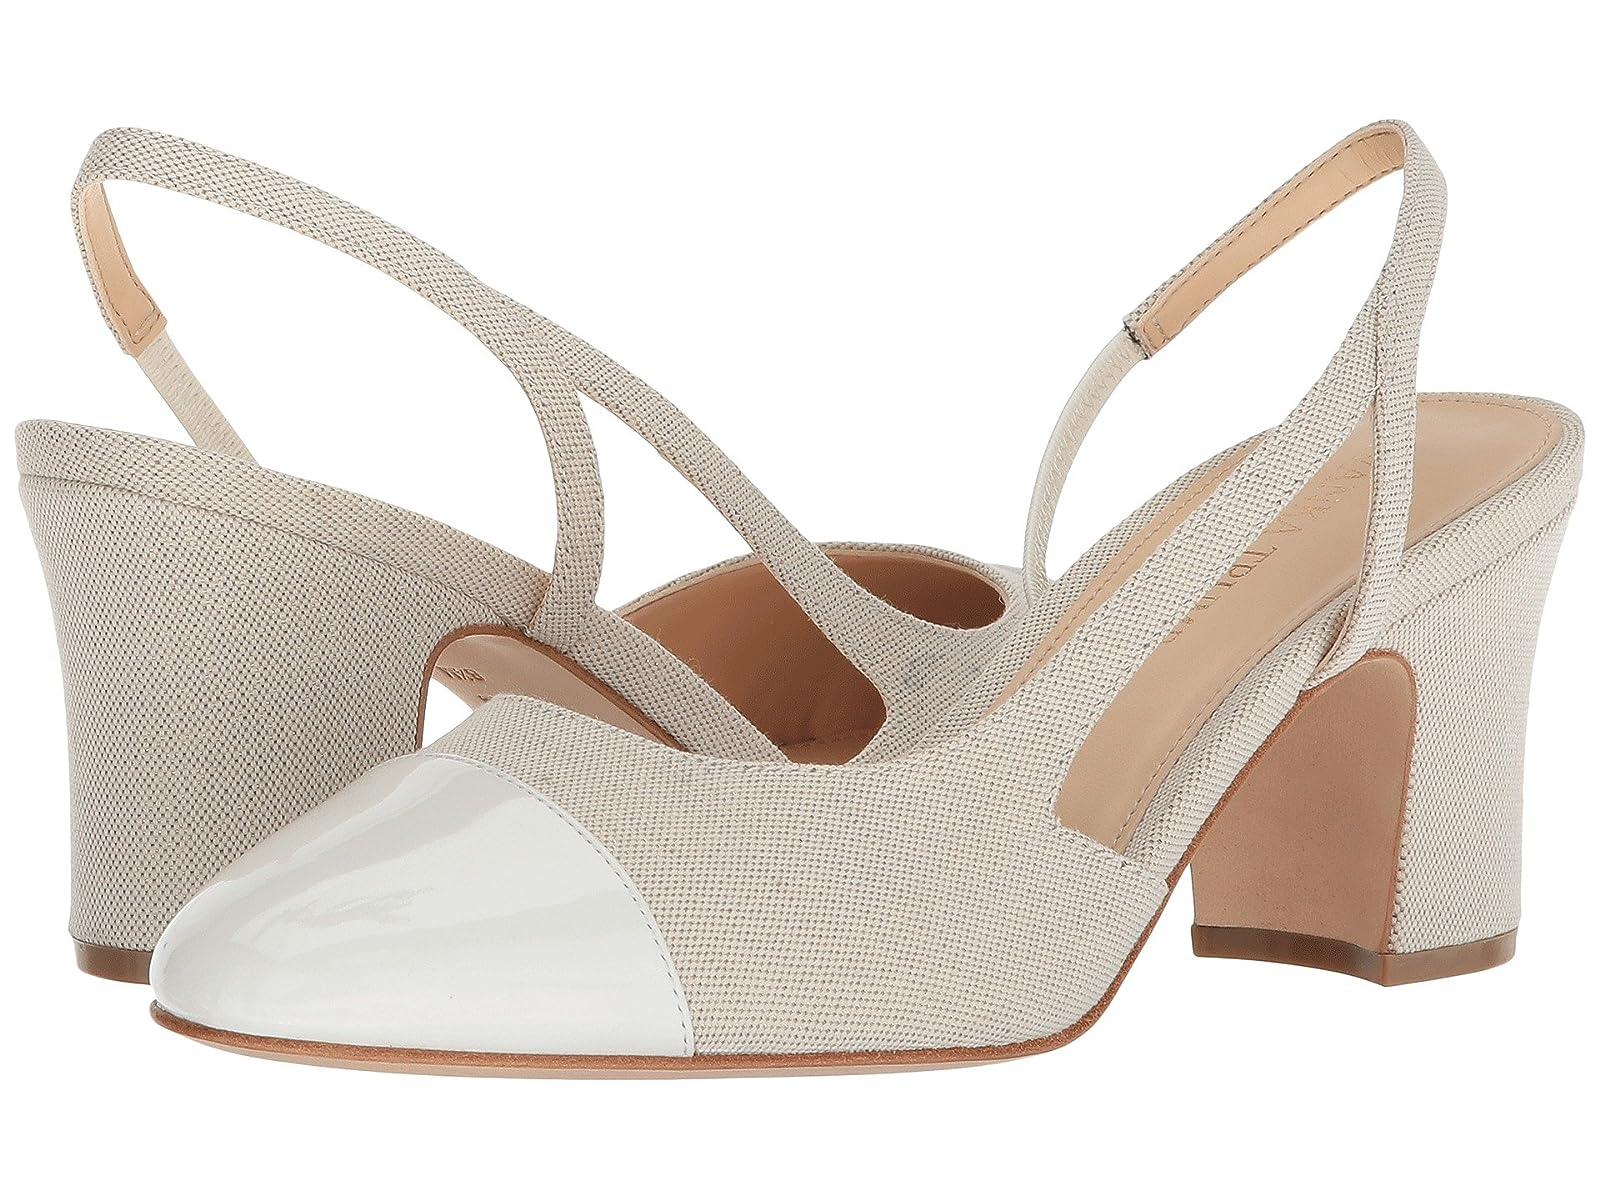 Ivanka Trump Liah 4Cheap and distinctive eye-catching shoes